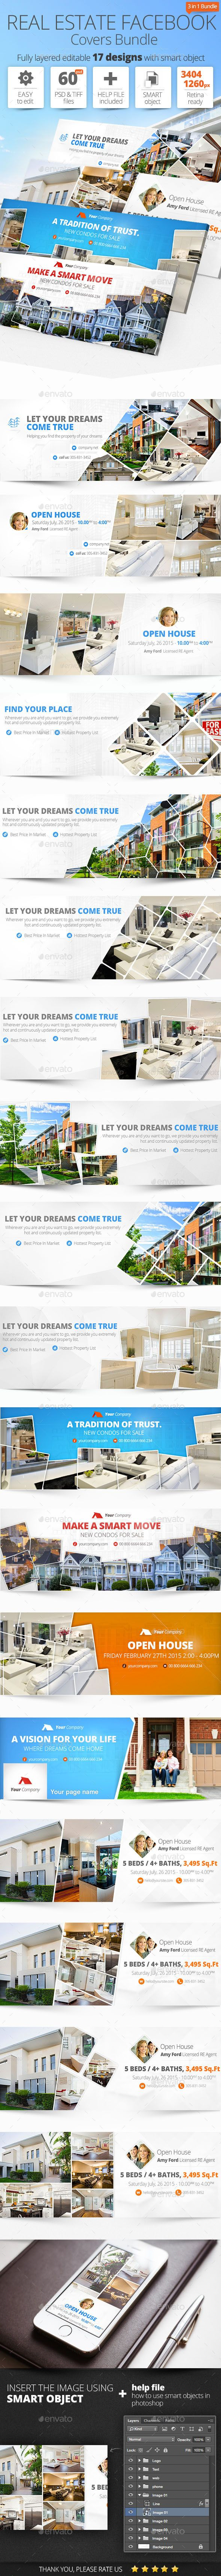 Real Estate Facebook Cover Bundle 17 Designs Template Download: http://graphicriver.net/item/real-estate-facebook-cover-bundle-17-designs/12361320?ref=ksioks